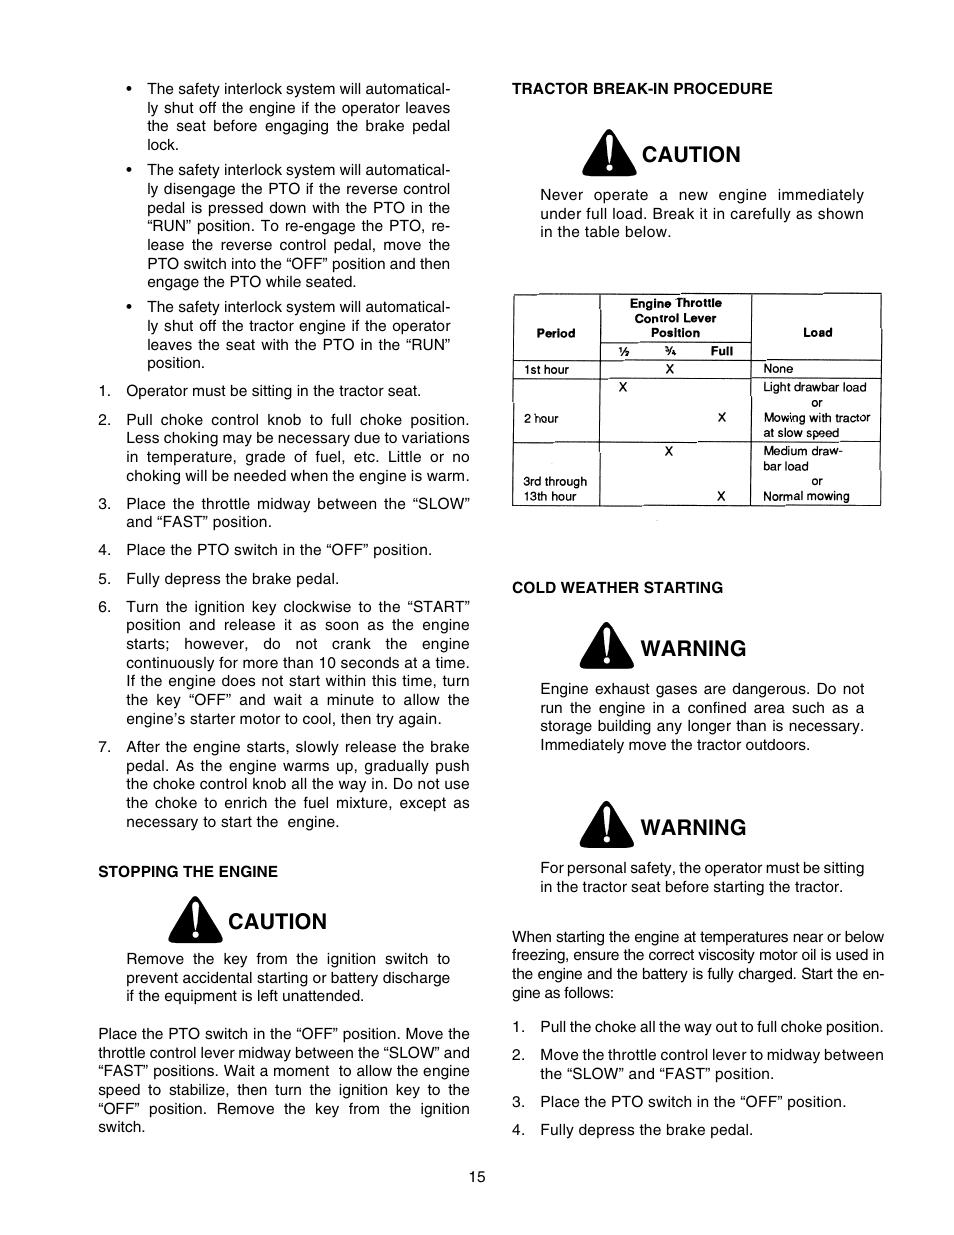 caution warning cub cadet 2166 user manual page 15 60 rh manualsdir com cub cadet 2166 manual and carb repair cub cadet 2166 operator's manual